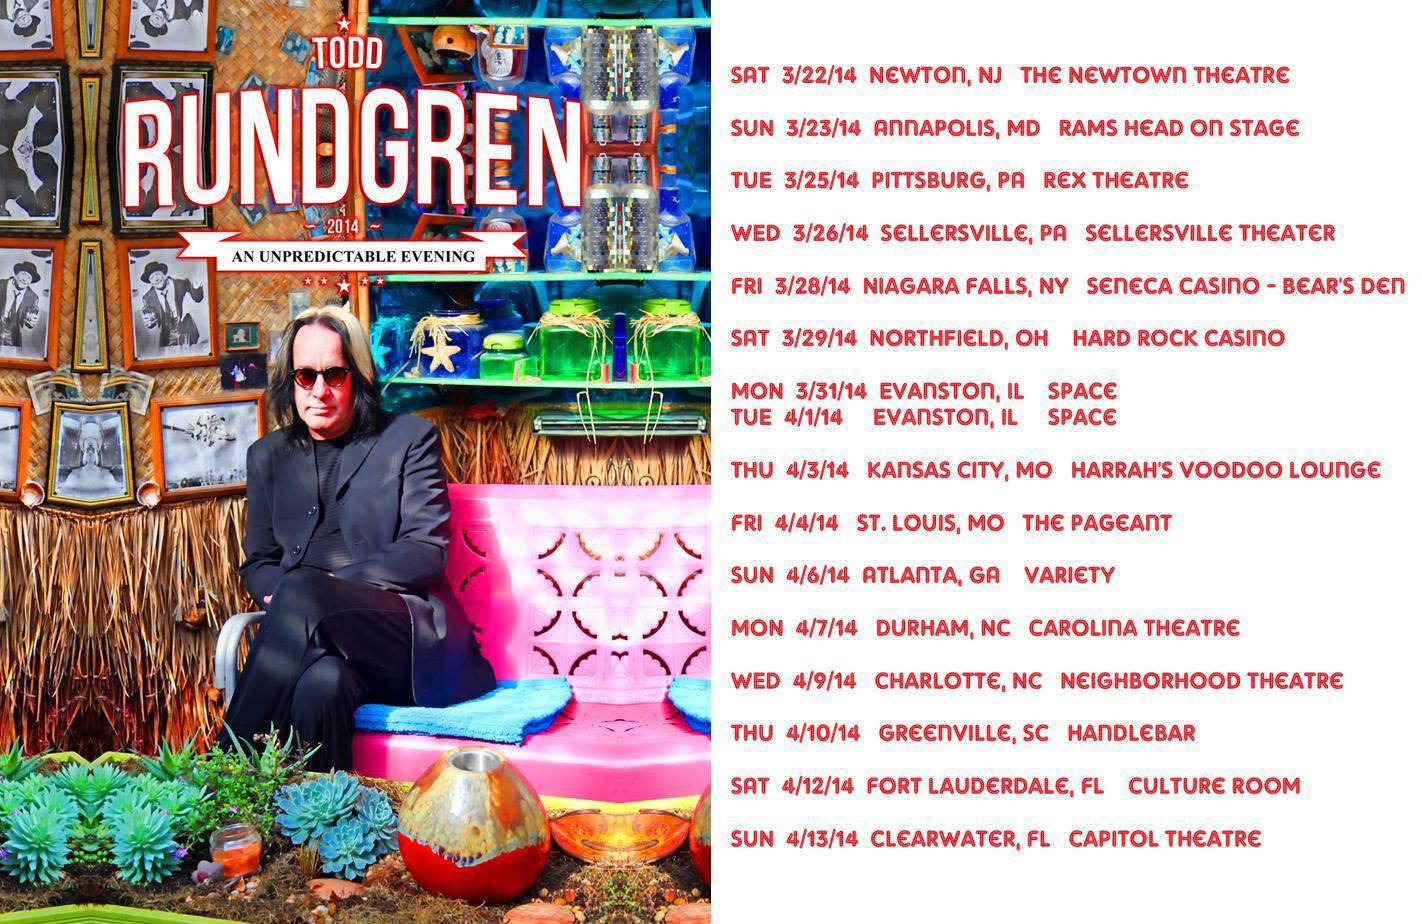 Todd Rundgren Unpredicatable 2014.jpg